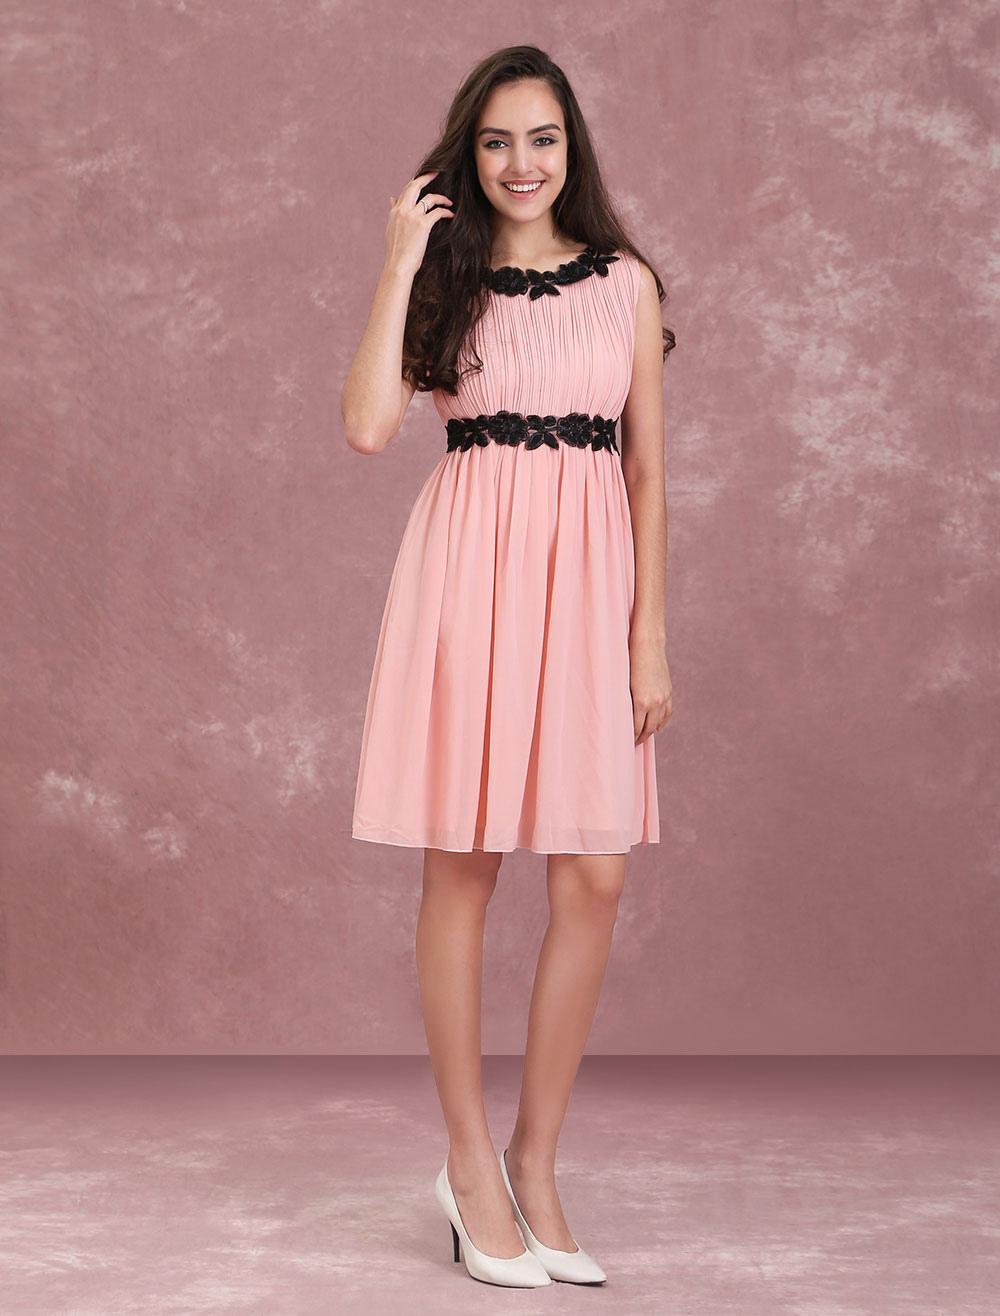 Pink Bridesmaid Dress Chiffon Cocktail Dress Lace Applique A Line Short Prom Dresses (Women\\'s Clothing Skater Dresses) photo